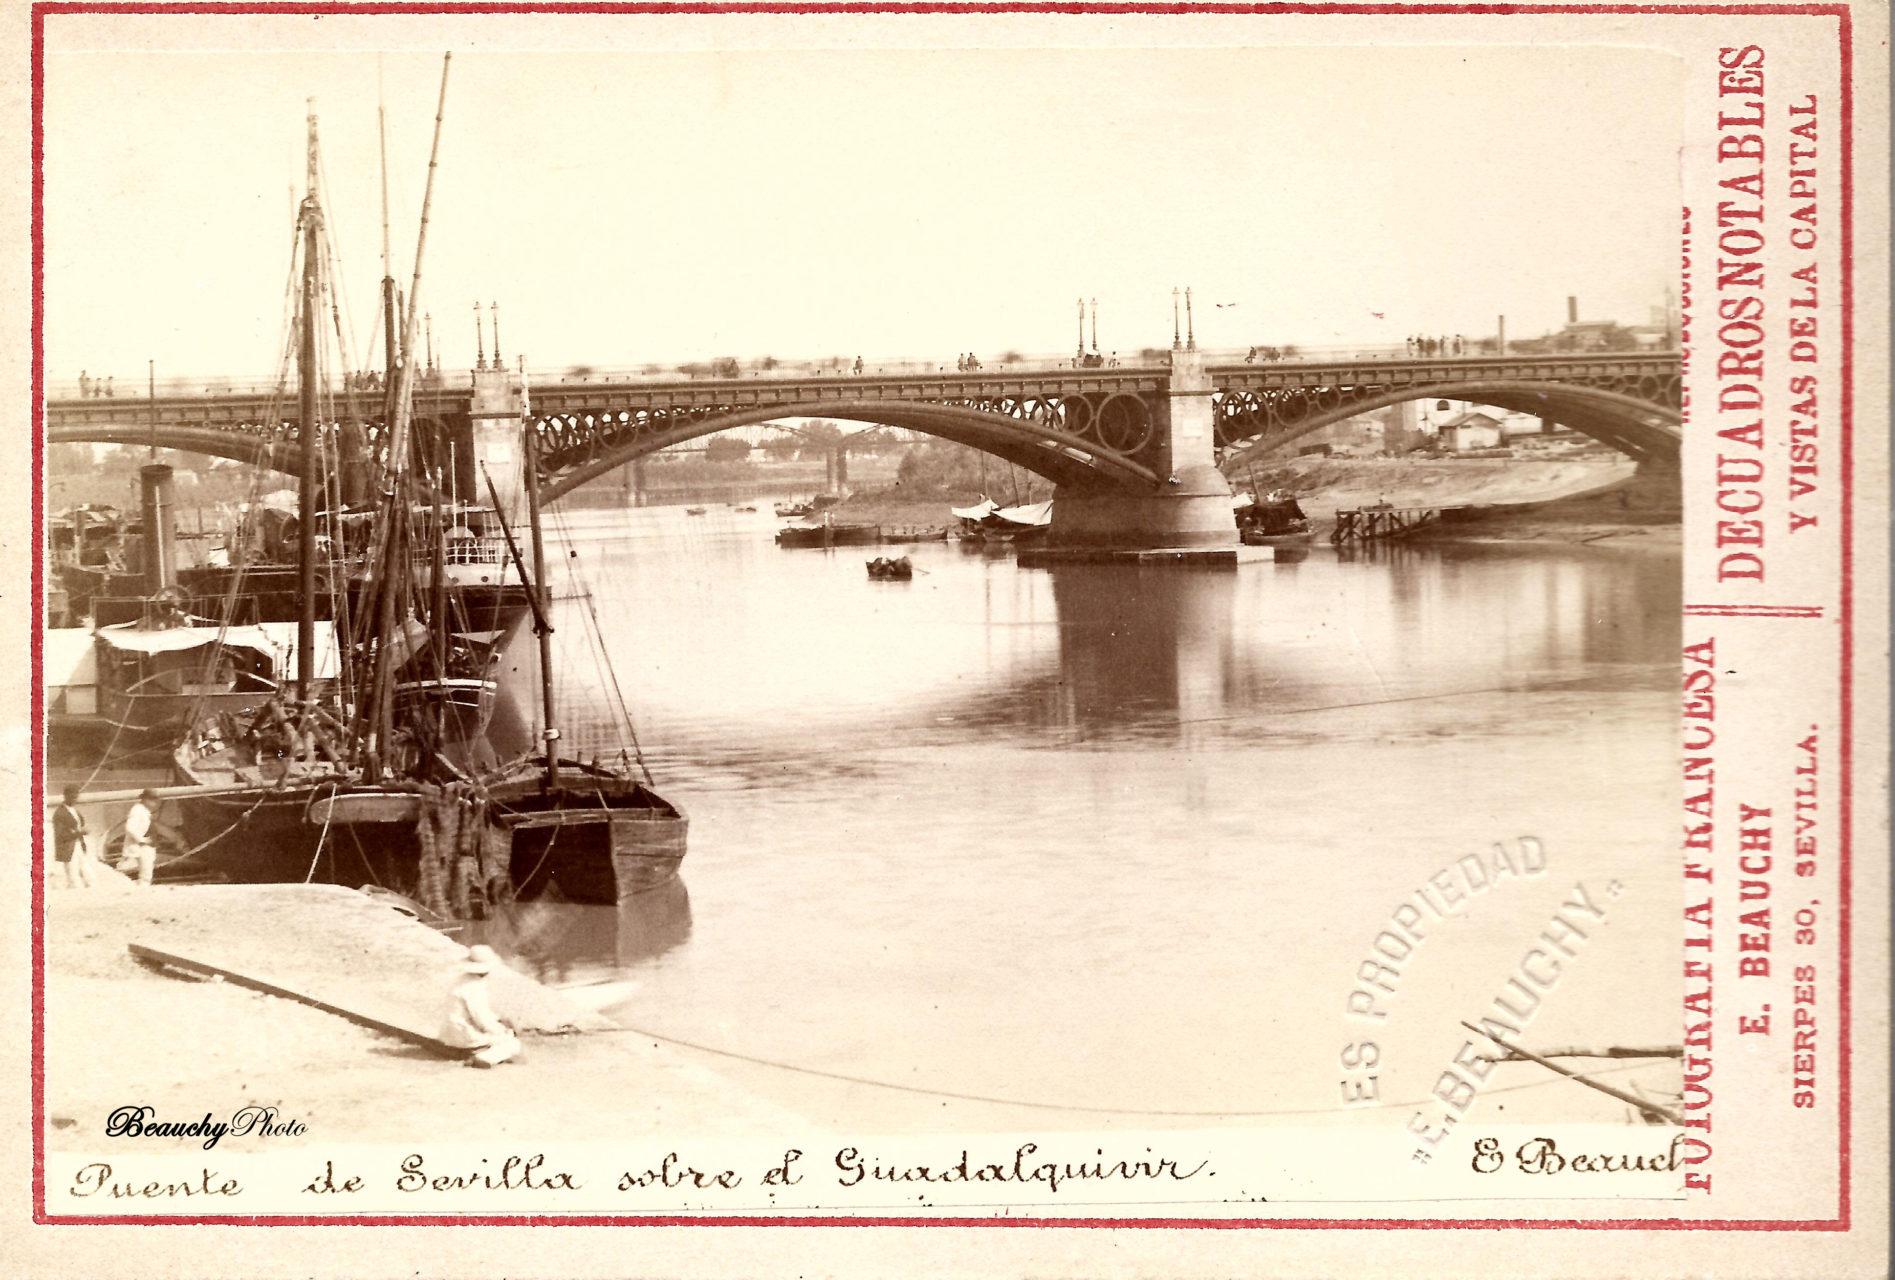 Beauchyphoto_Puente_Isabel_II_Emilio_Beauchy_Cano_fotografias_antiguas_postales_vistas_y_monumentos